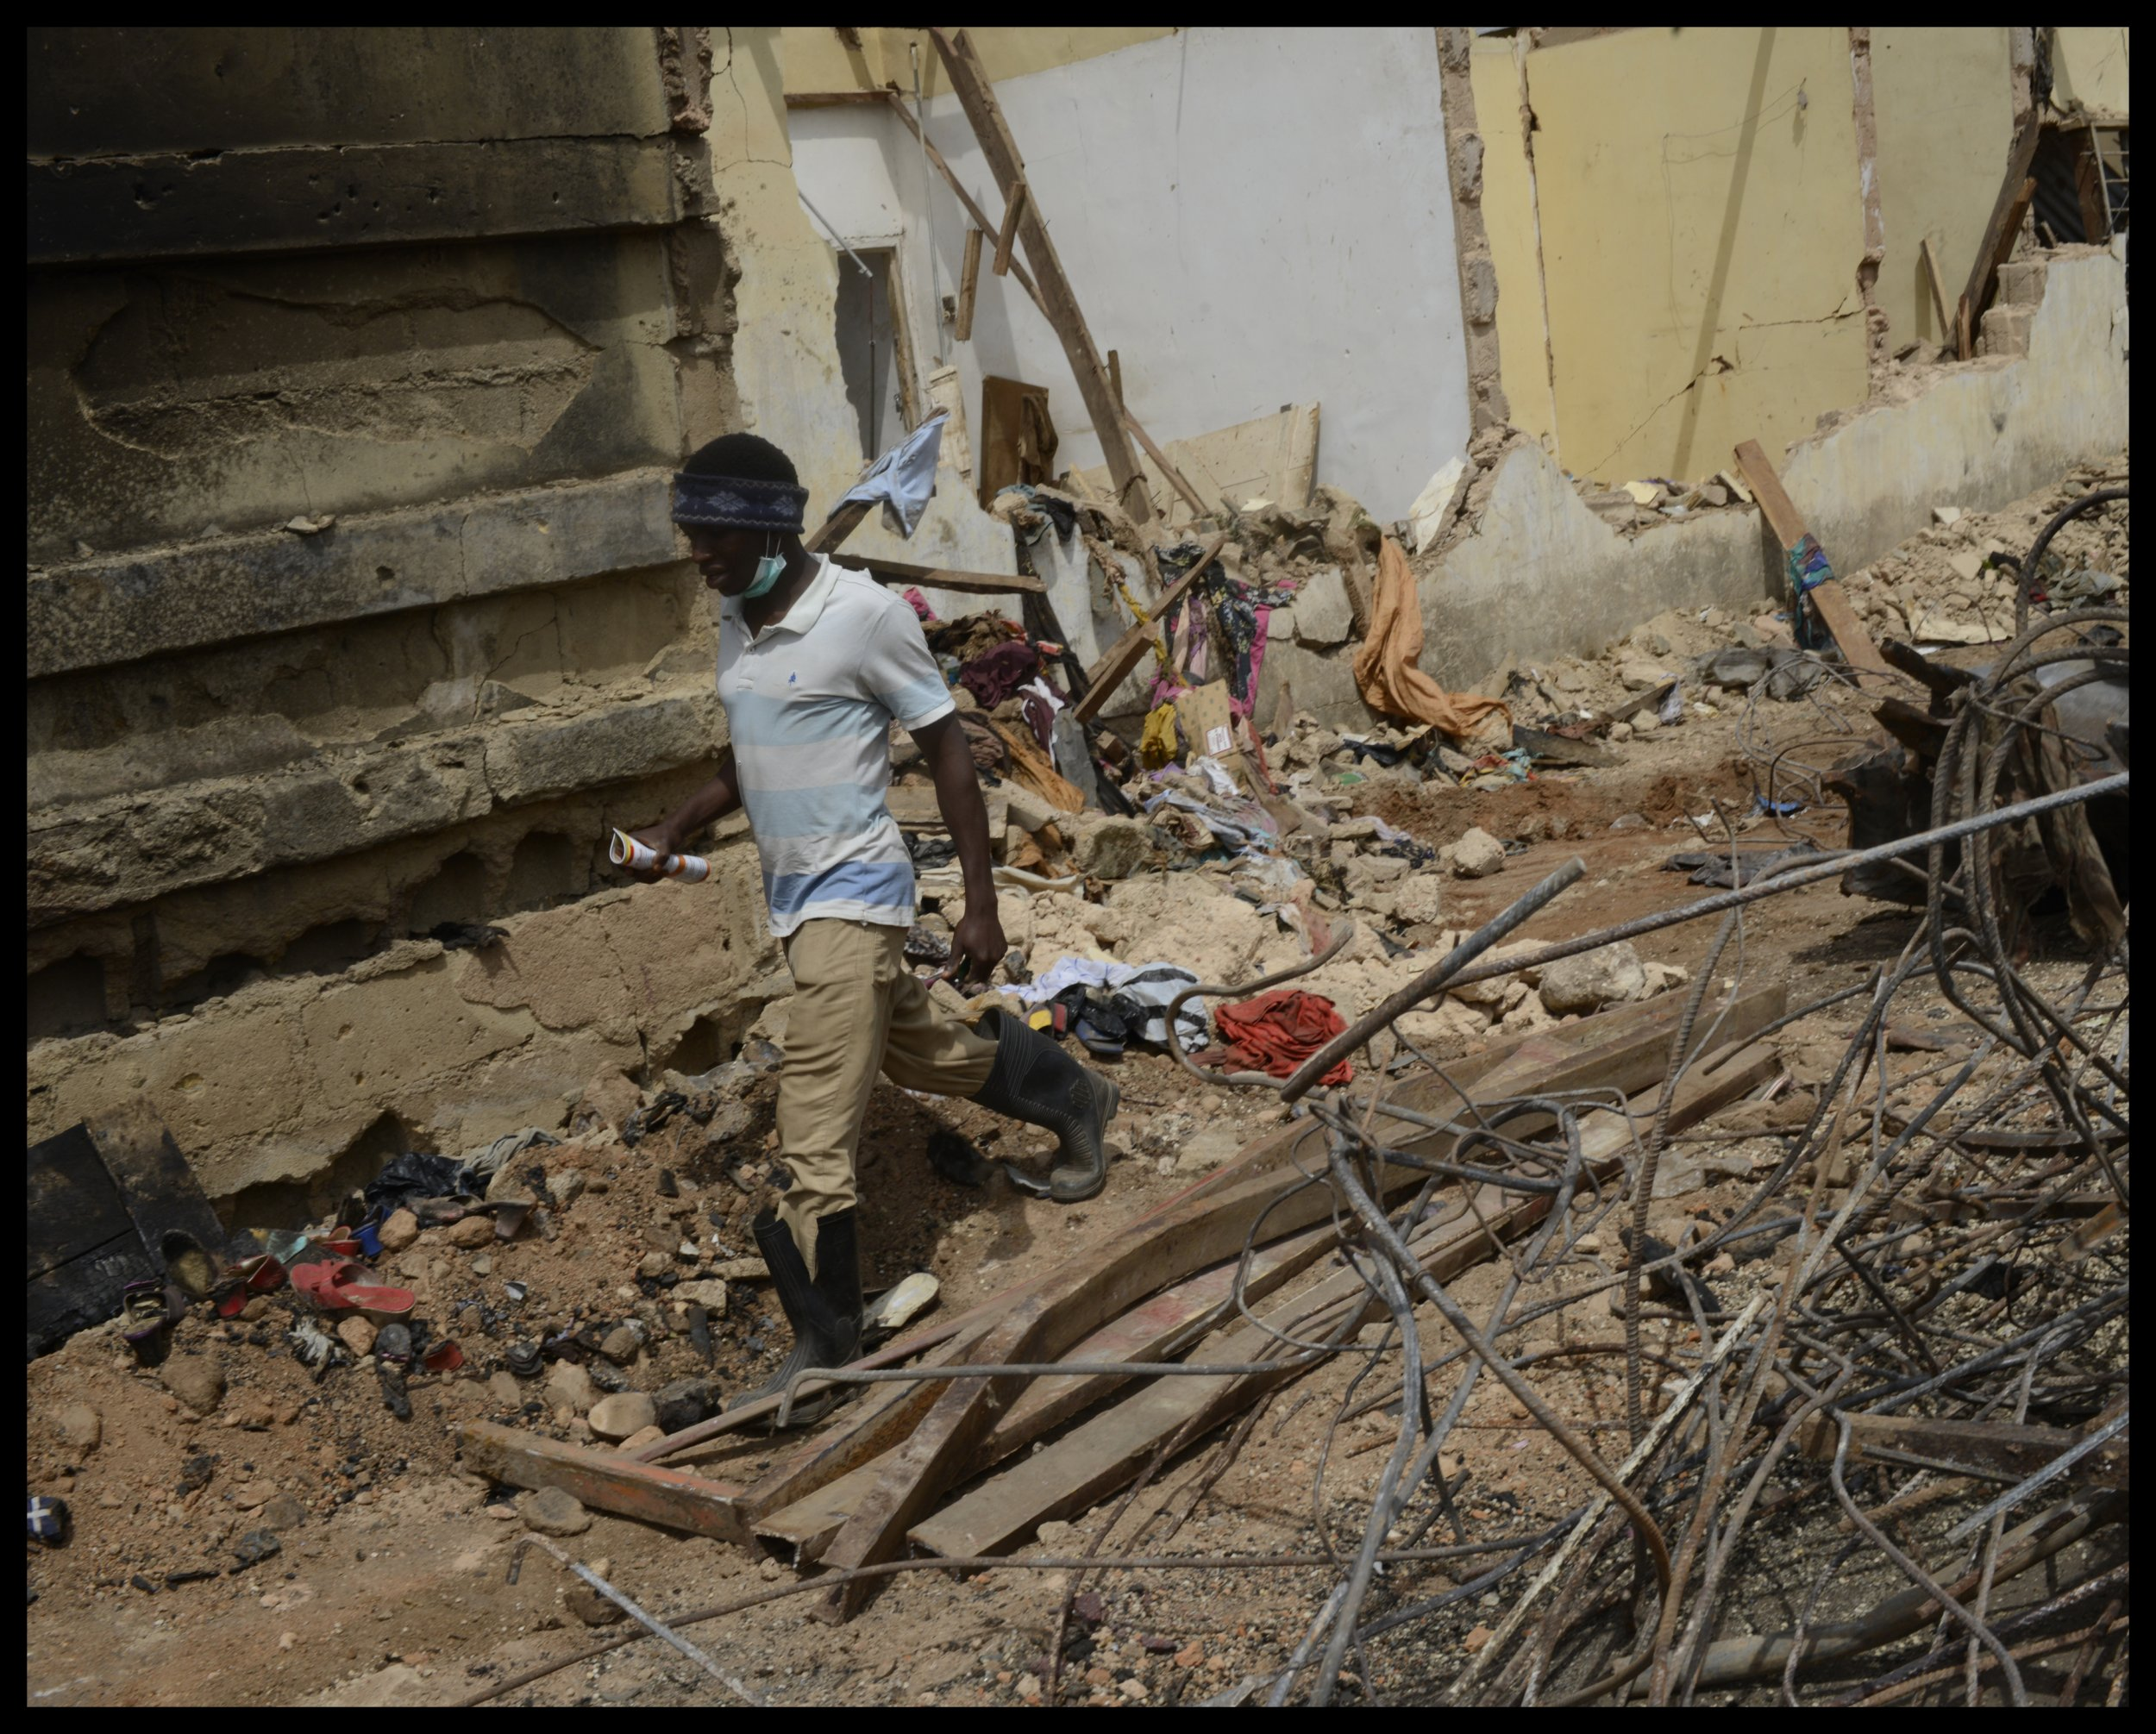 Boko Haram bombing site